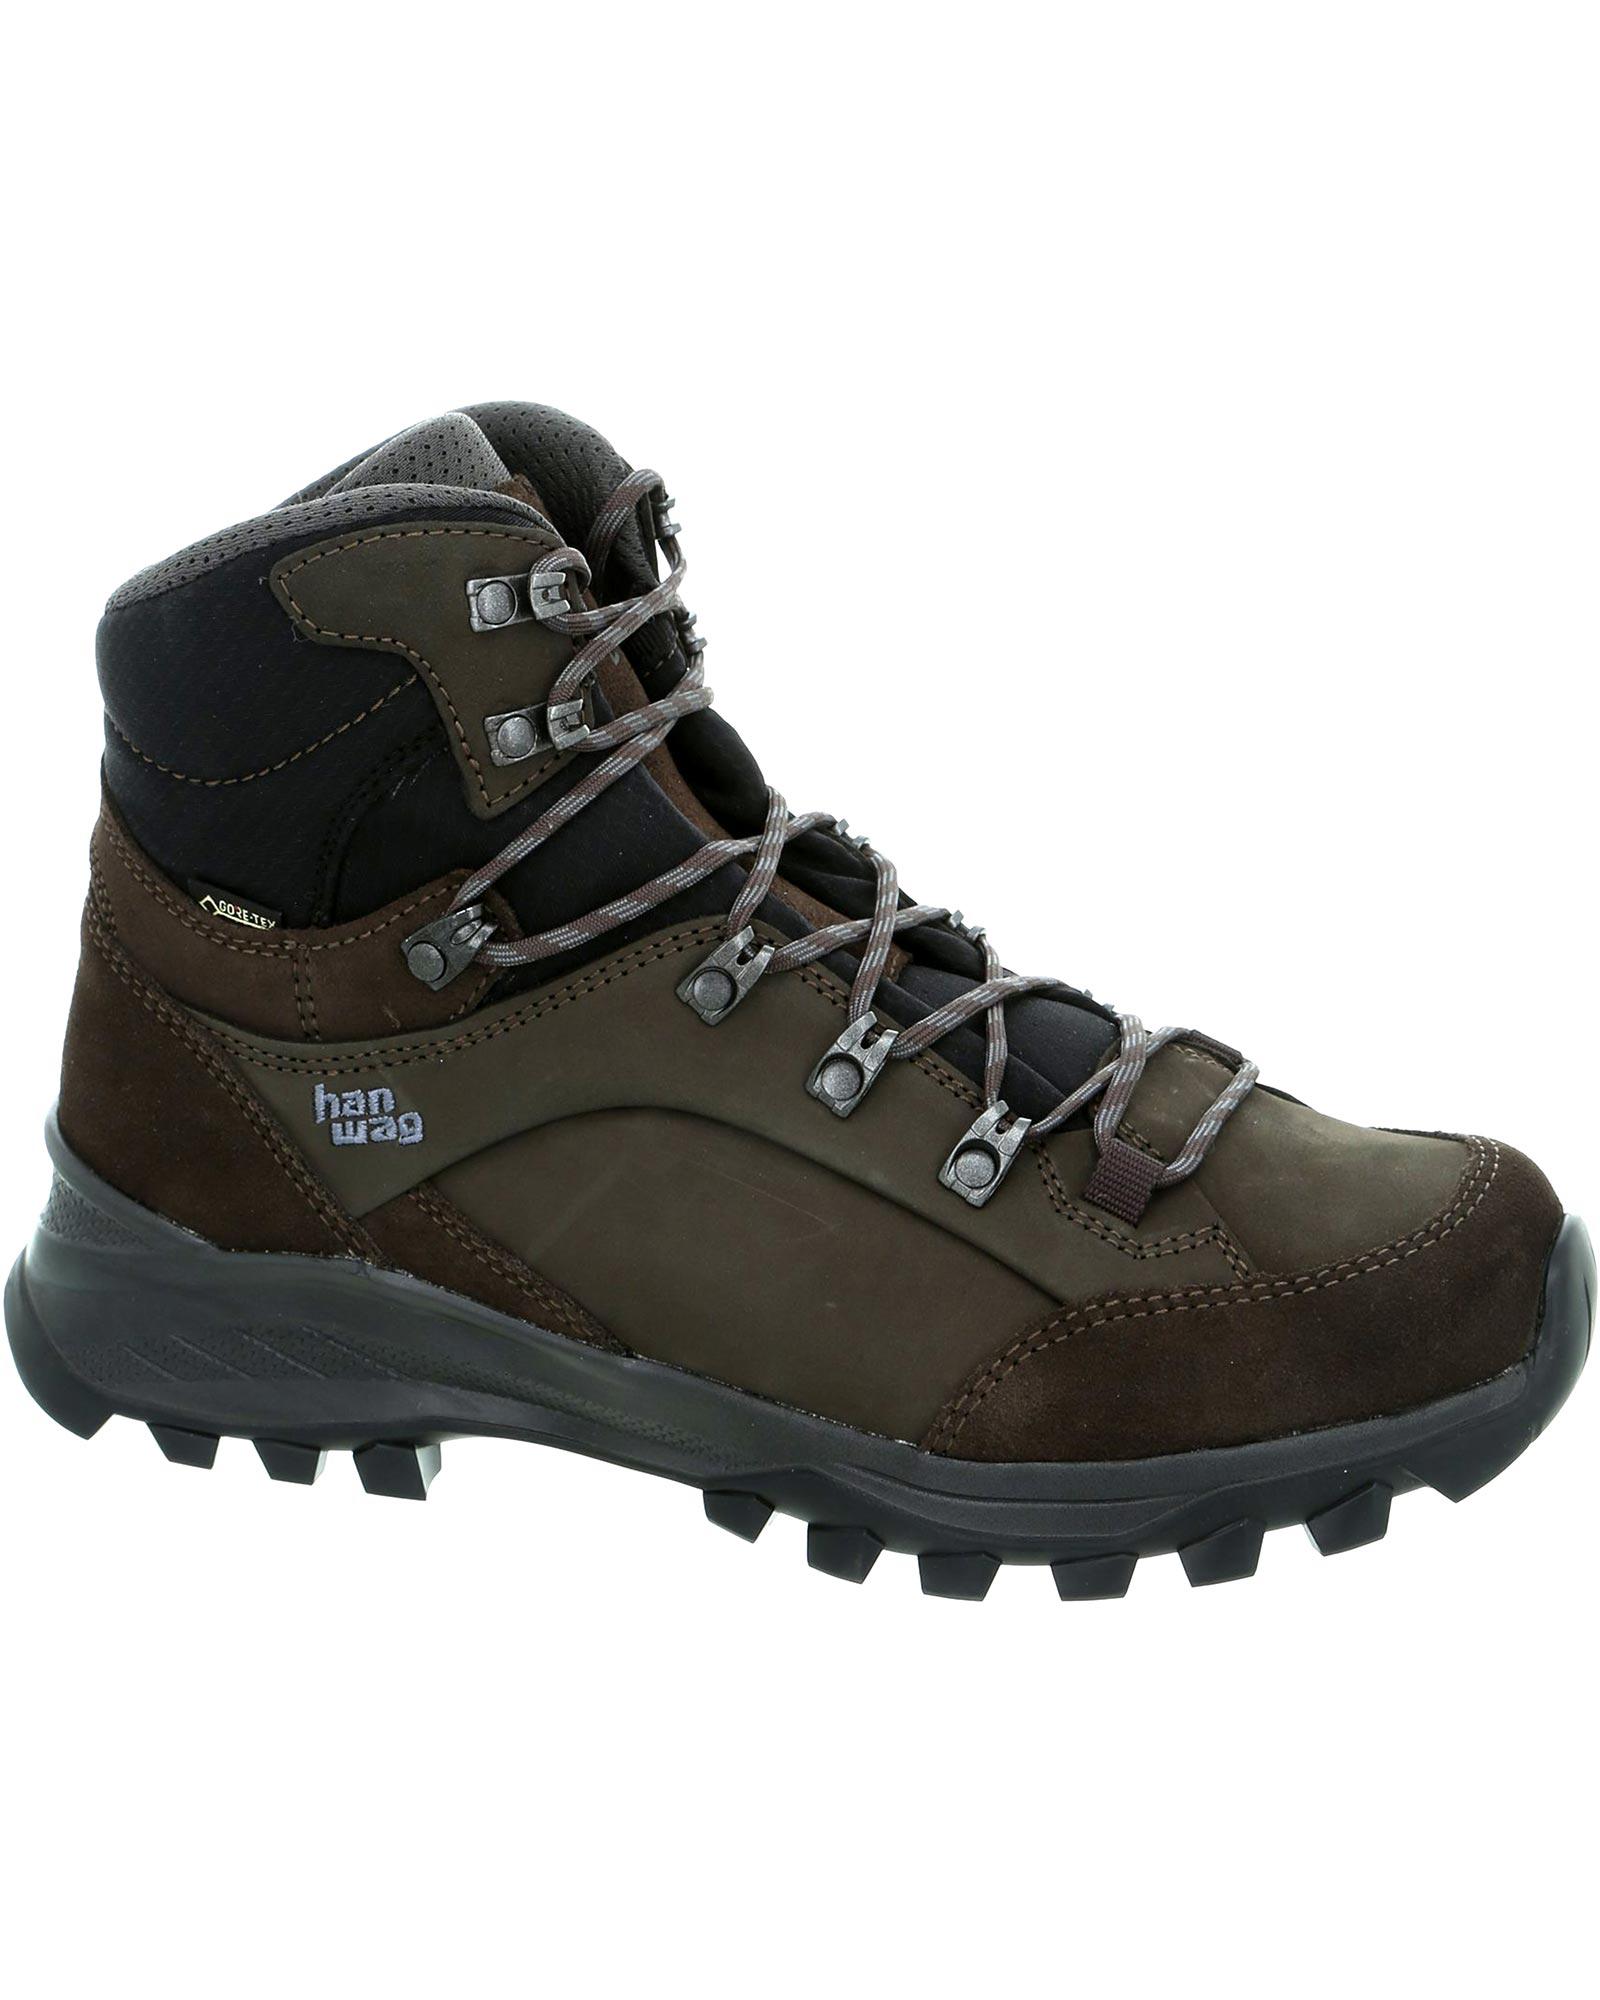 Hanwag Men's Banks GORE-TEX Walking Boots Mocca/Asphalt 0